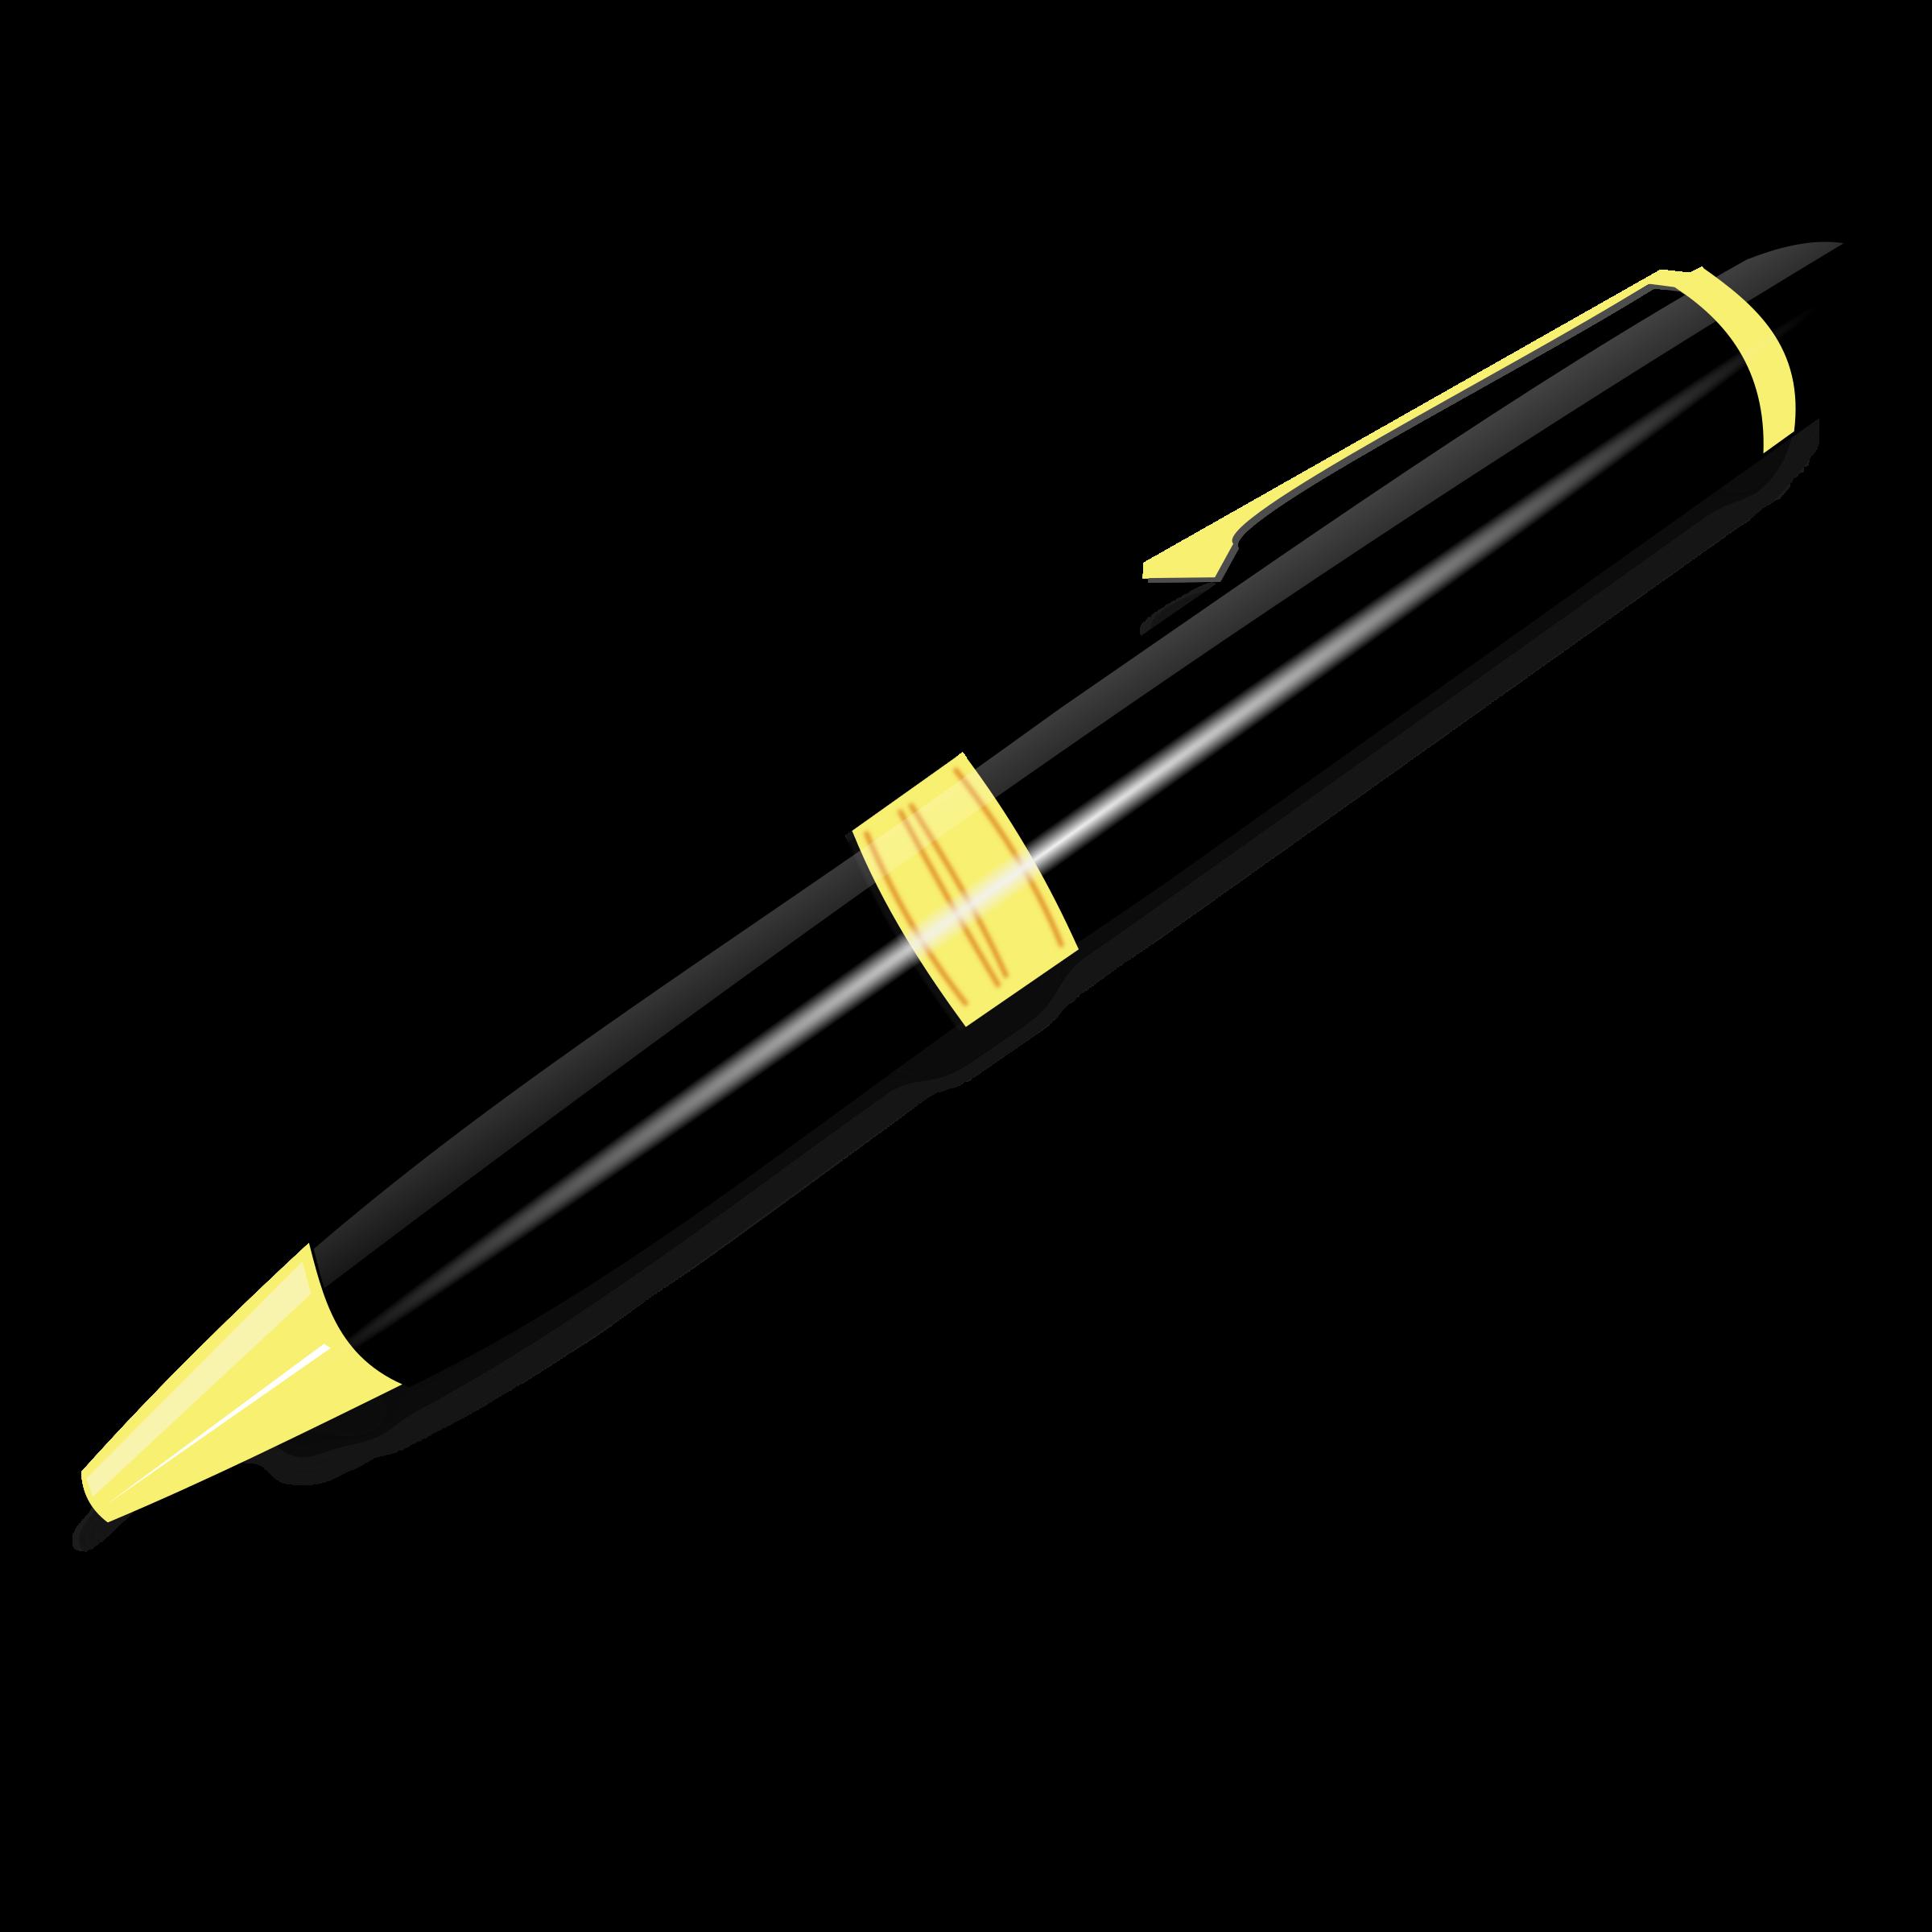 Essay clipart pen pad. Png transparent free images